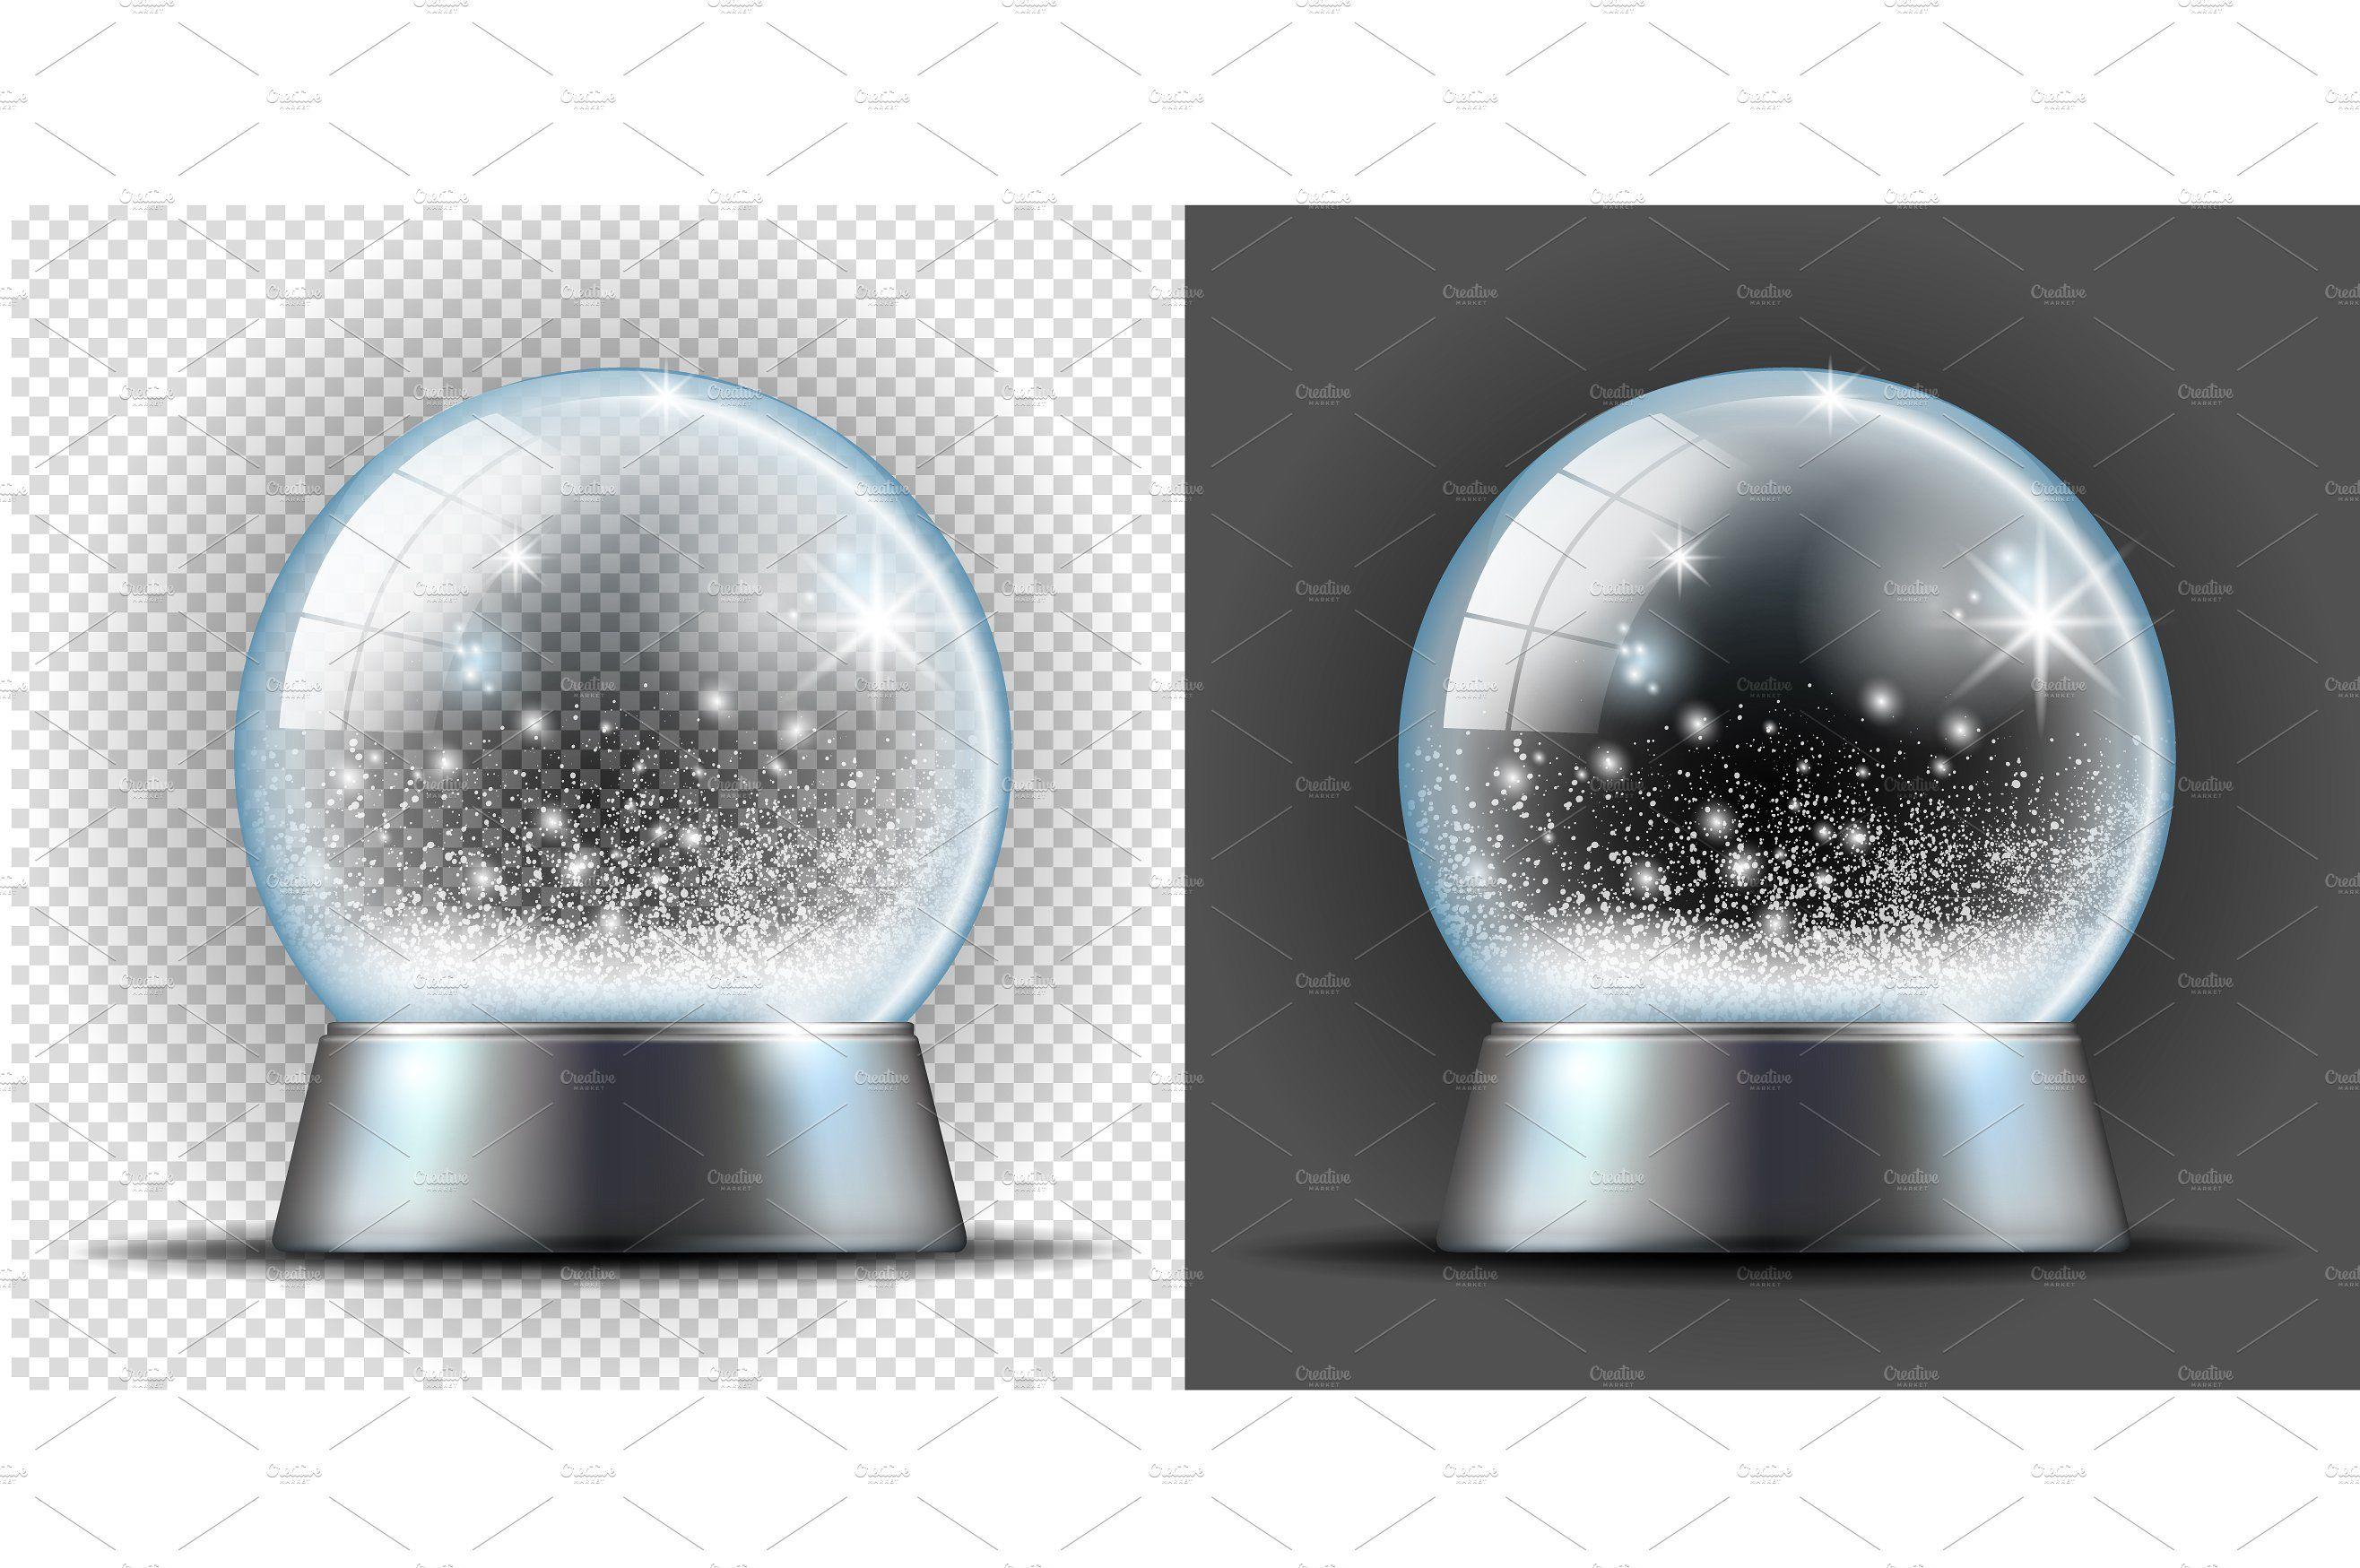 Realistic Transarent Snow Ball Snowball Snow Vintage Icons